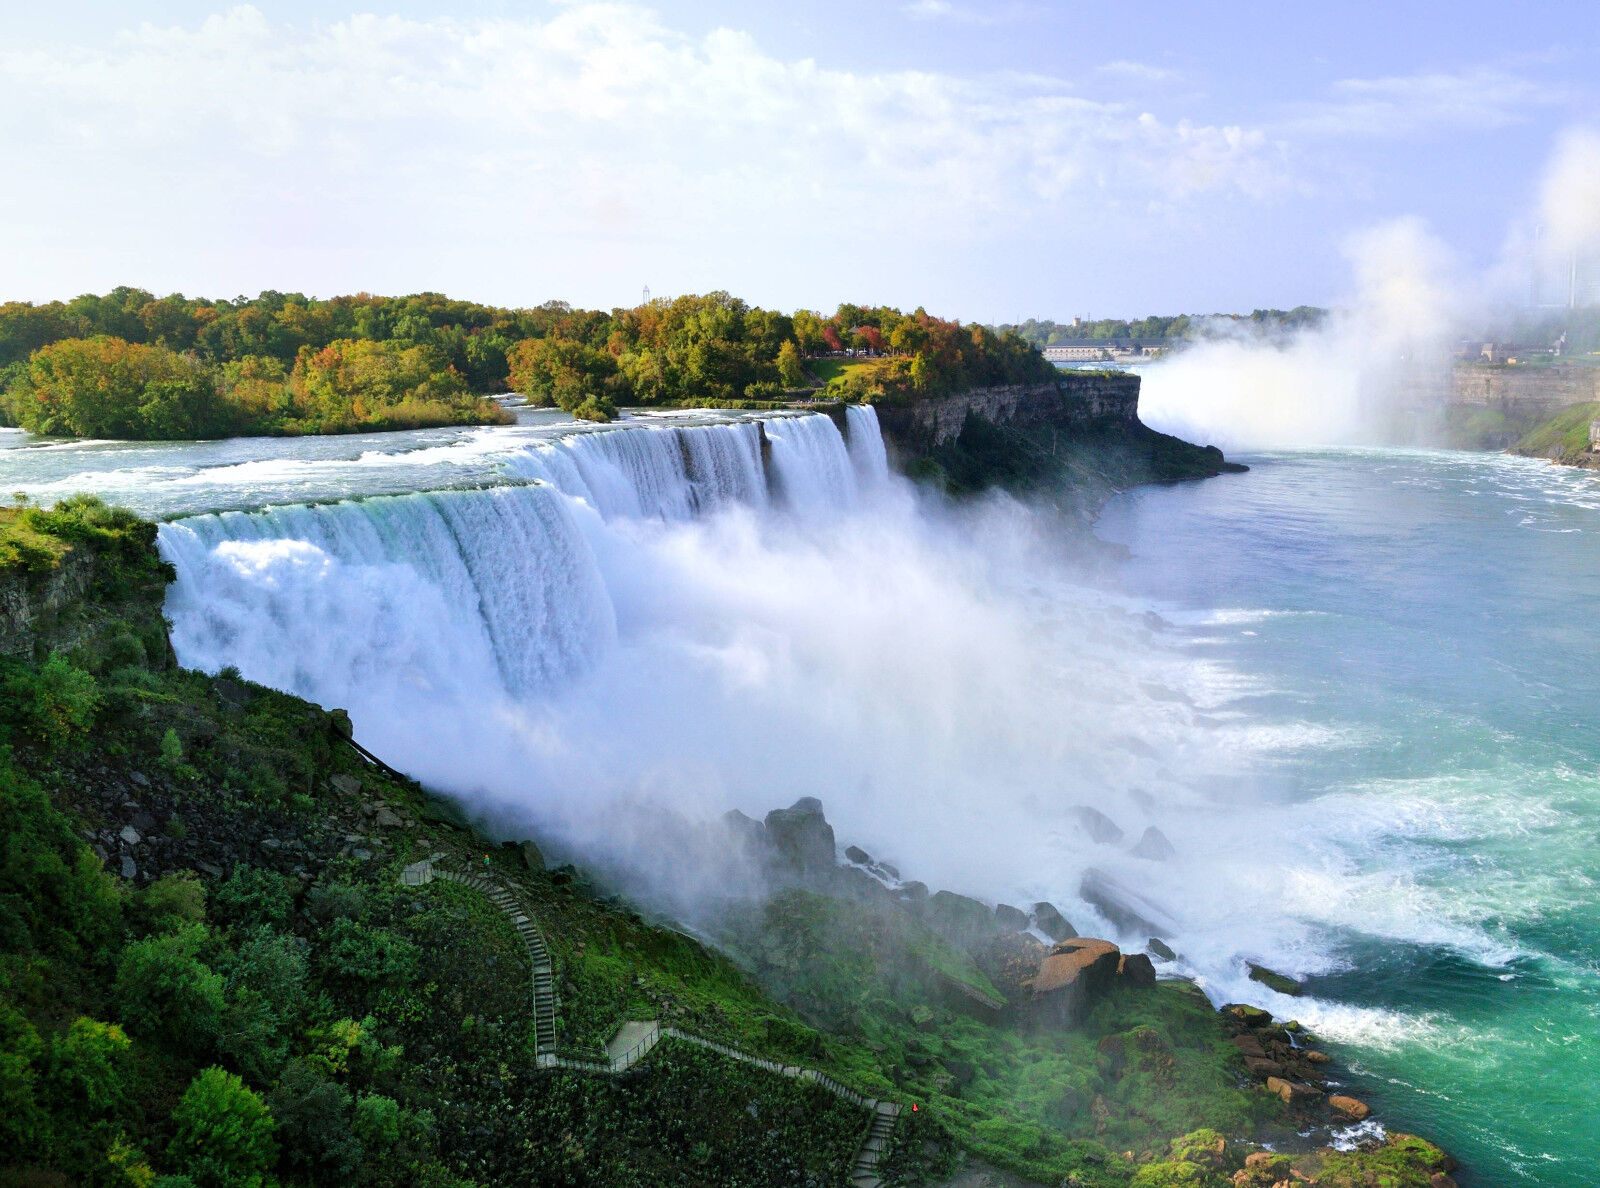 Fototapete-NIAGARA FALLS (314P)-350x260cm-7Bahnen-Wasserfall Meer See Steine XXL